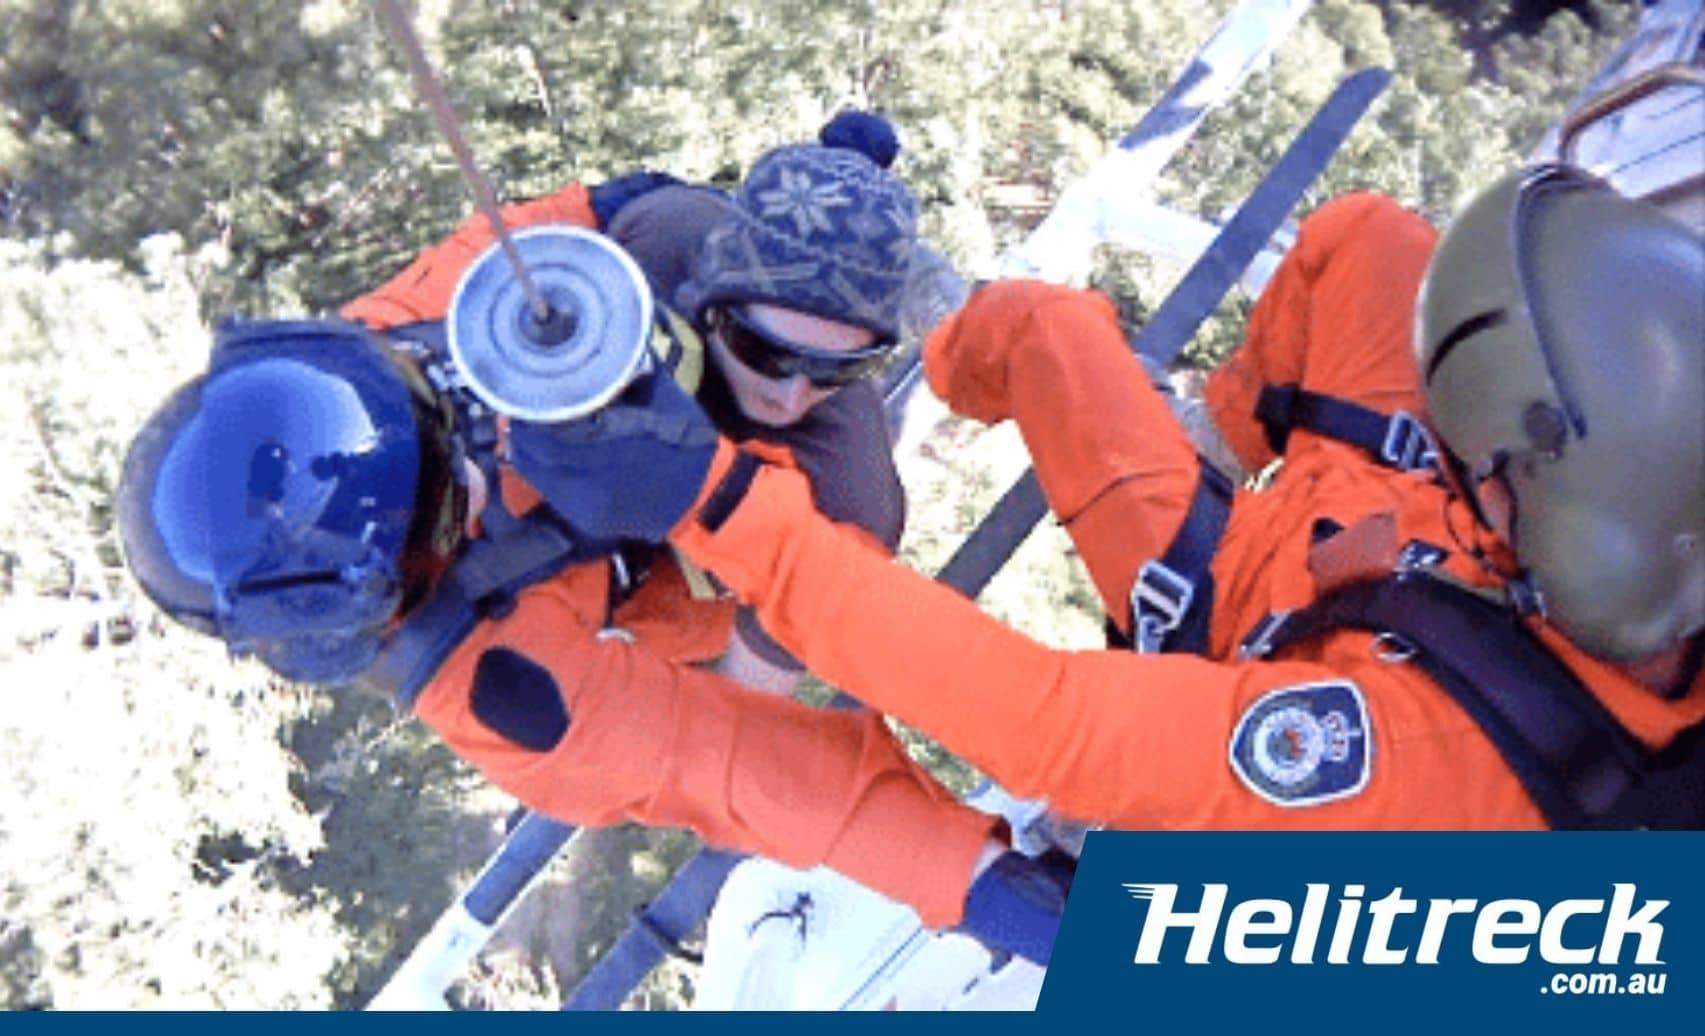 SearchRescue-Helitreck-3